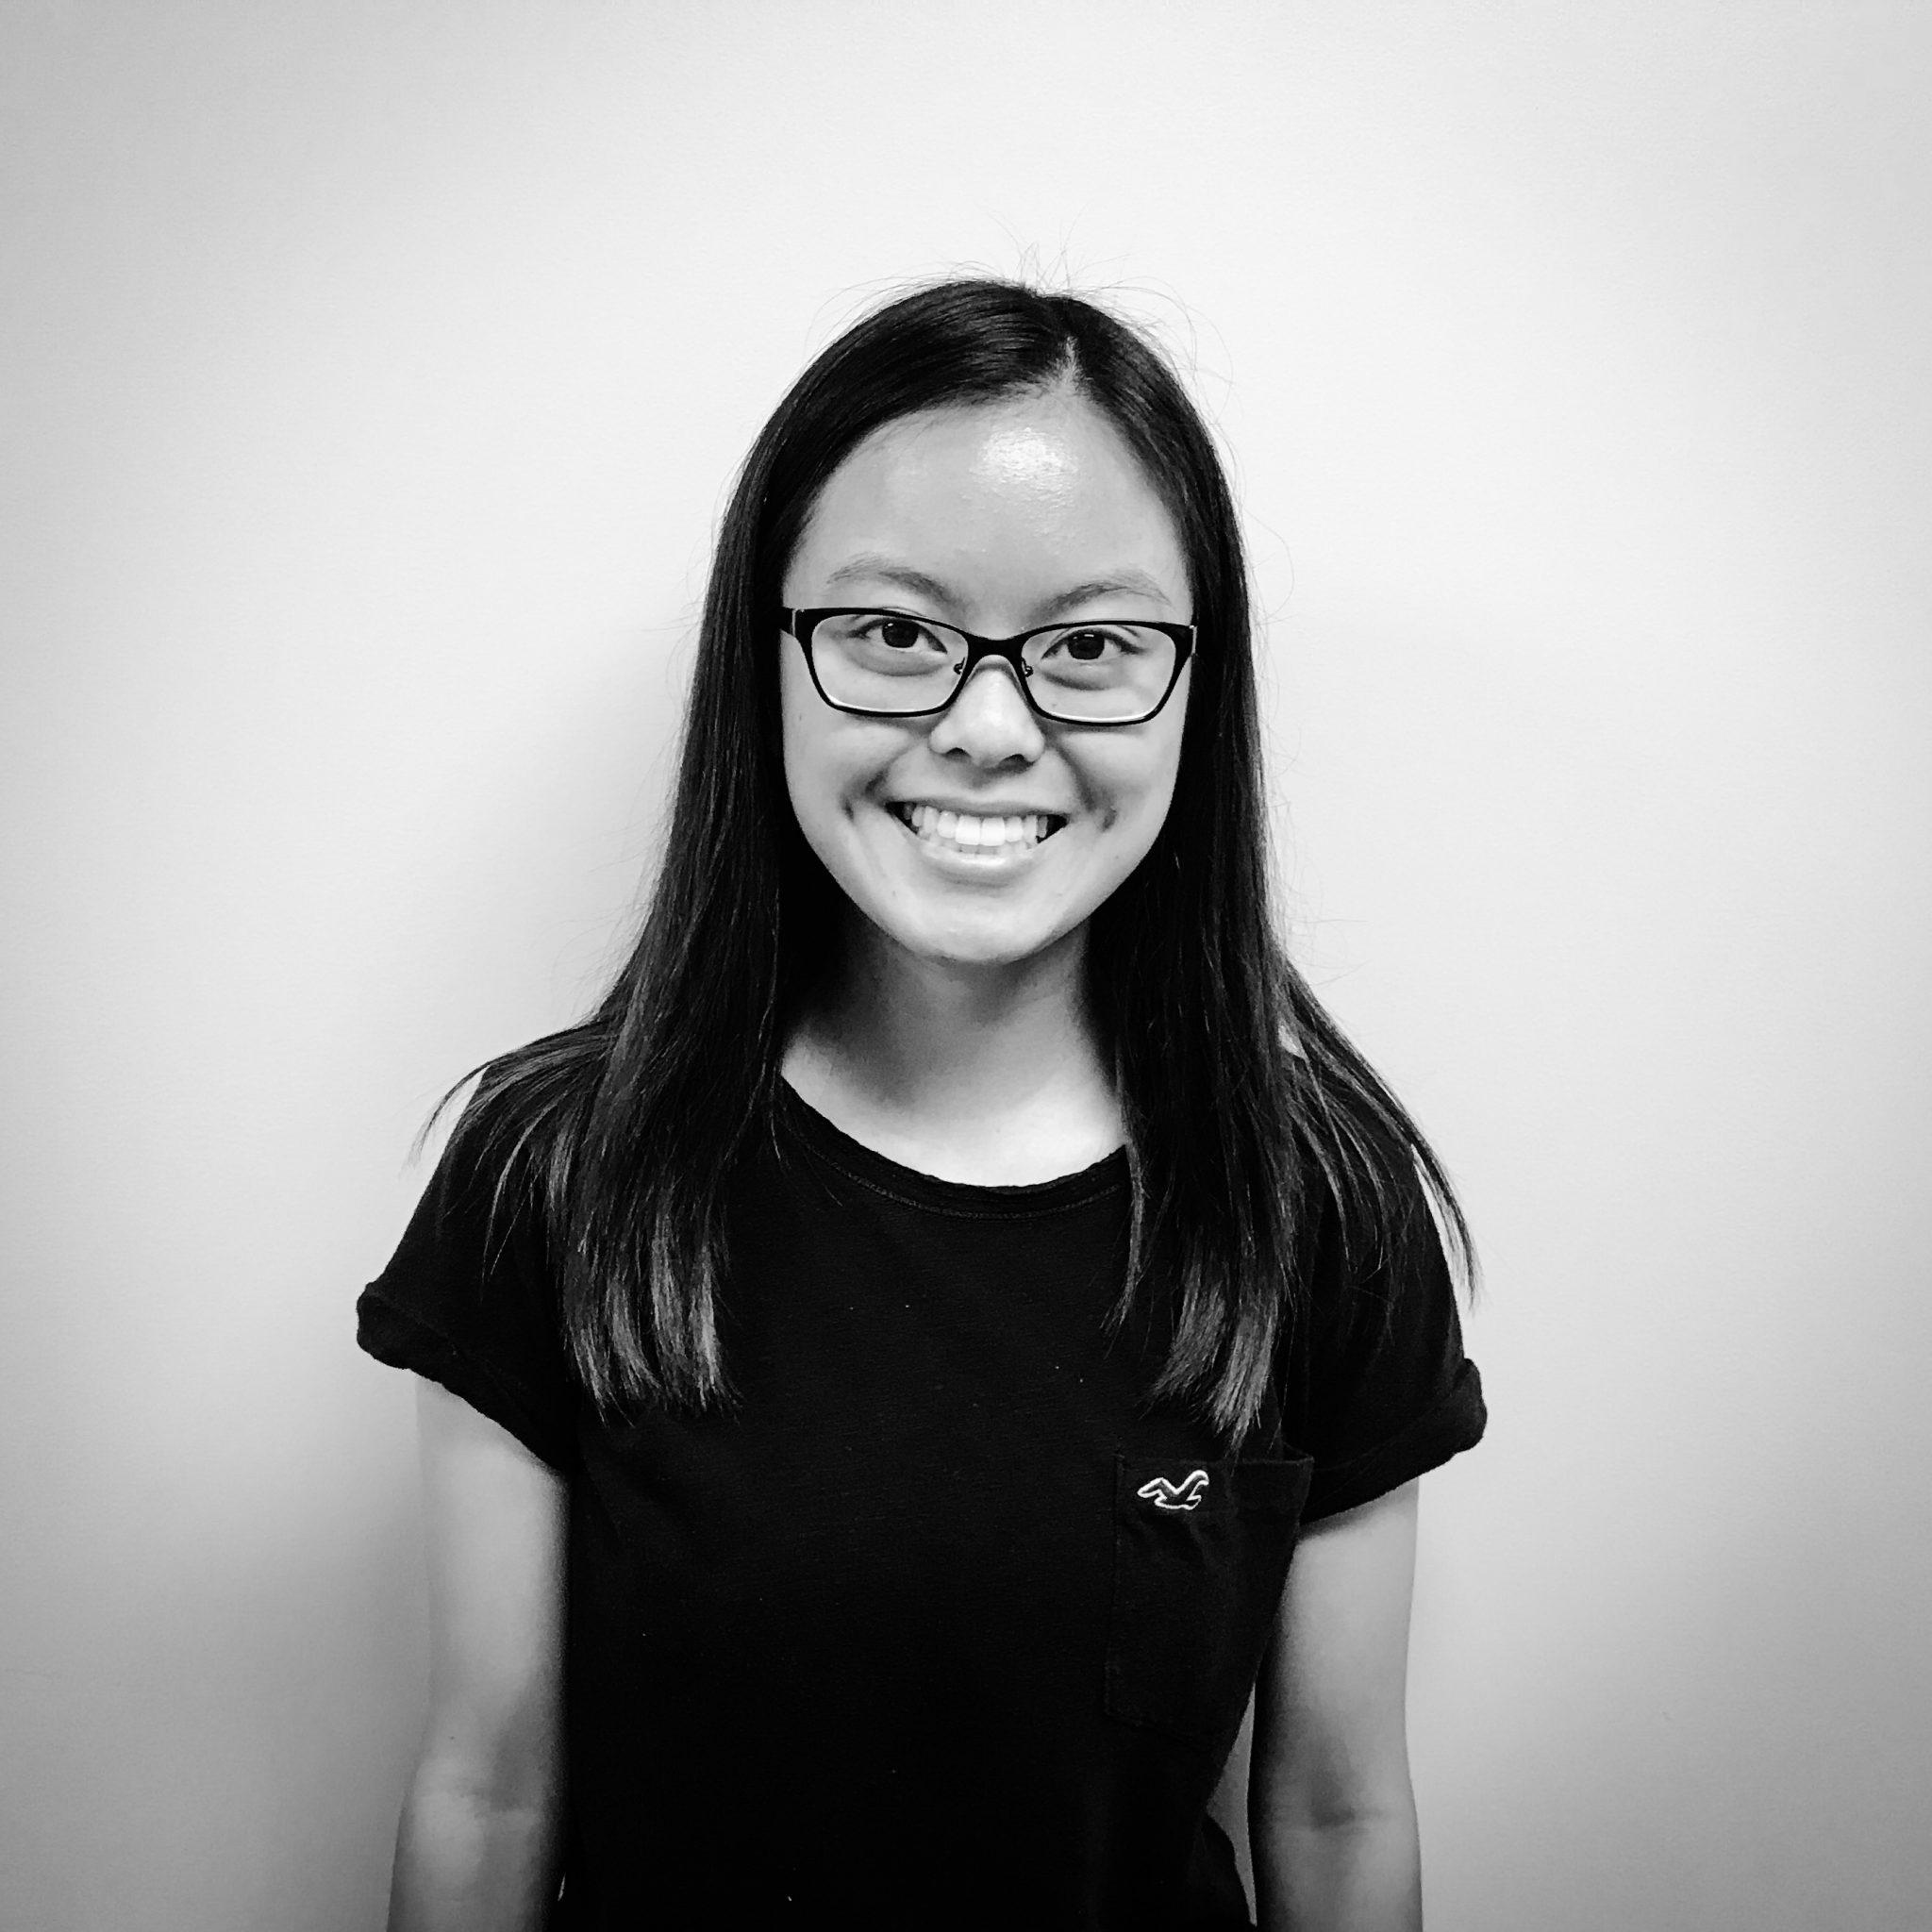 <b>Lisa</b><br />Accounting & Finance '21<br />  <i>Be yourself, work hard, have fun.<i></i></i>